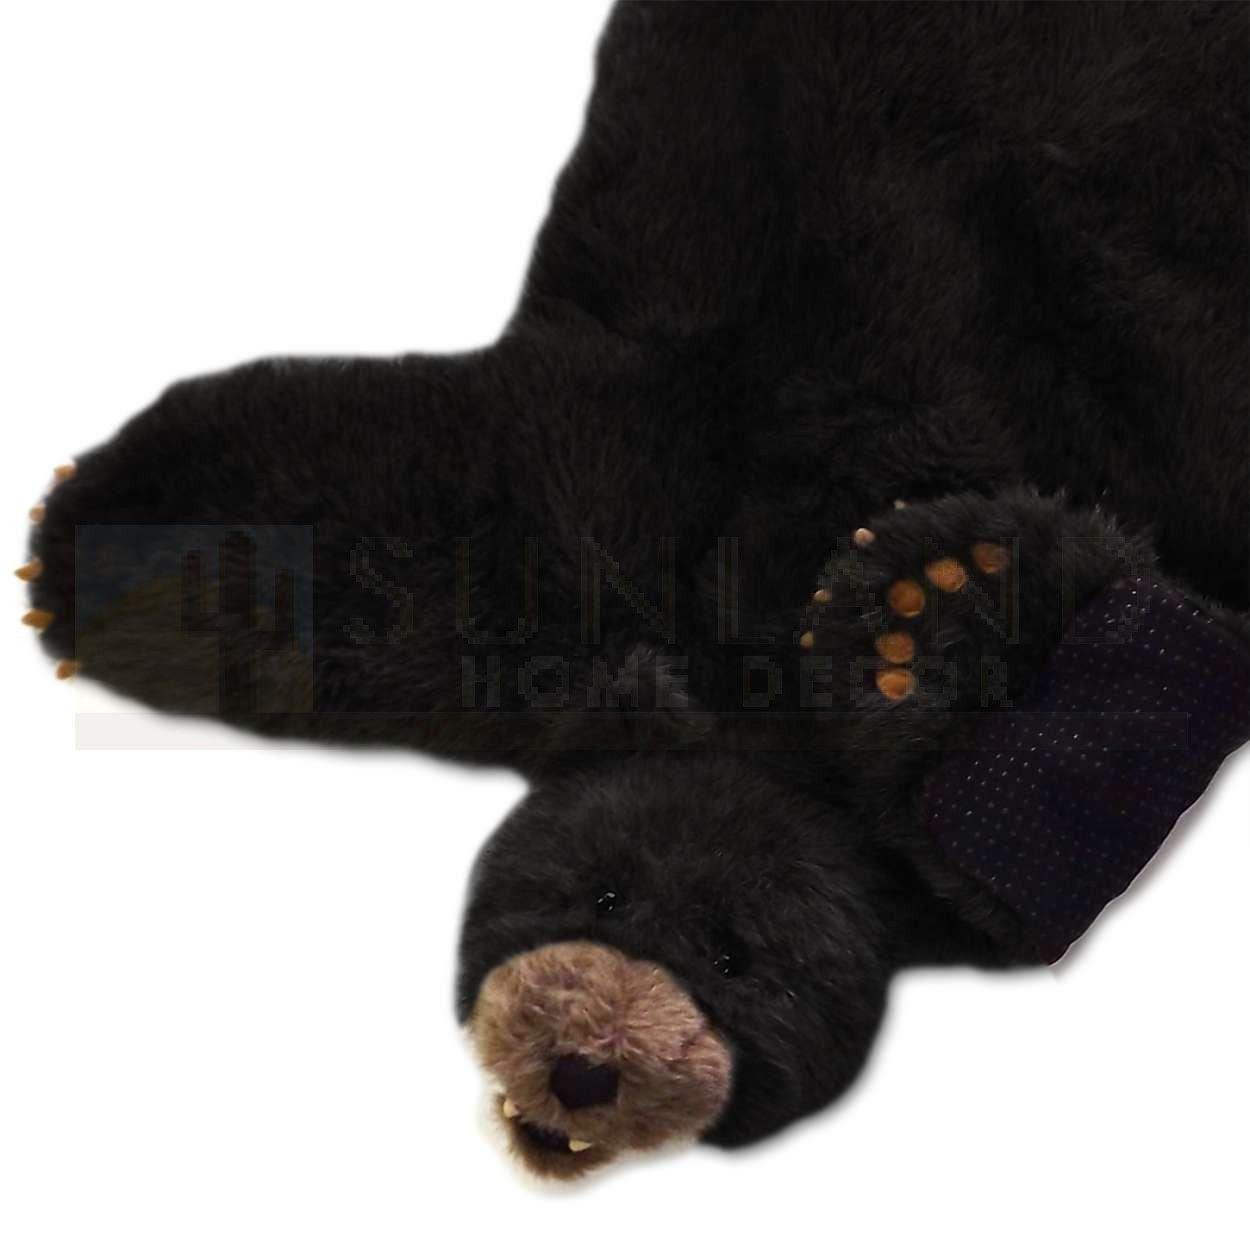 Sunland Home Decor Sbr201 Plush Animal Rug 36in Black Bear